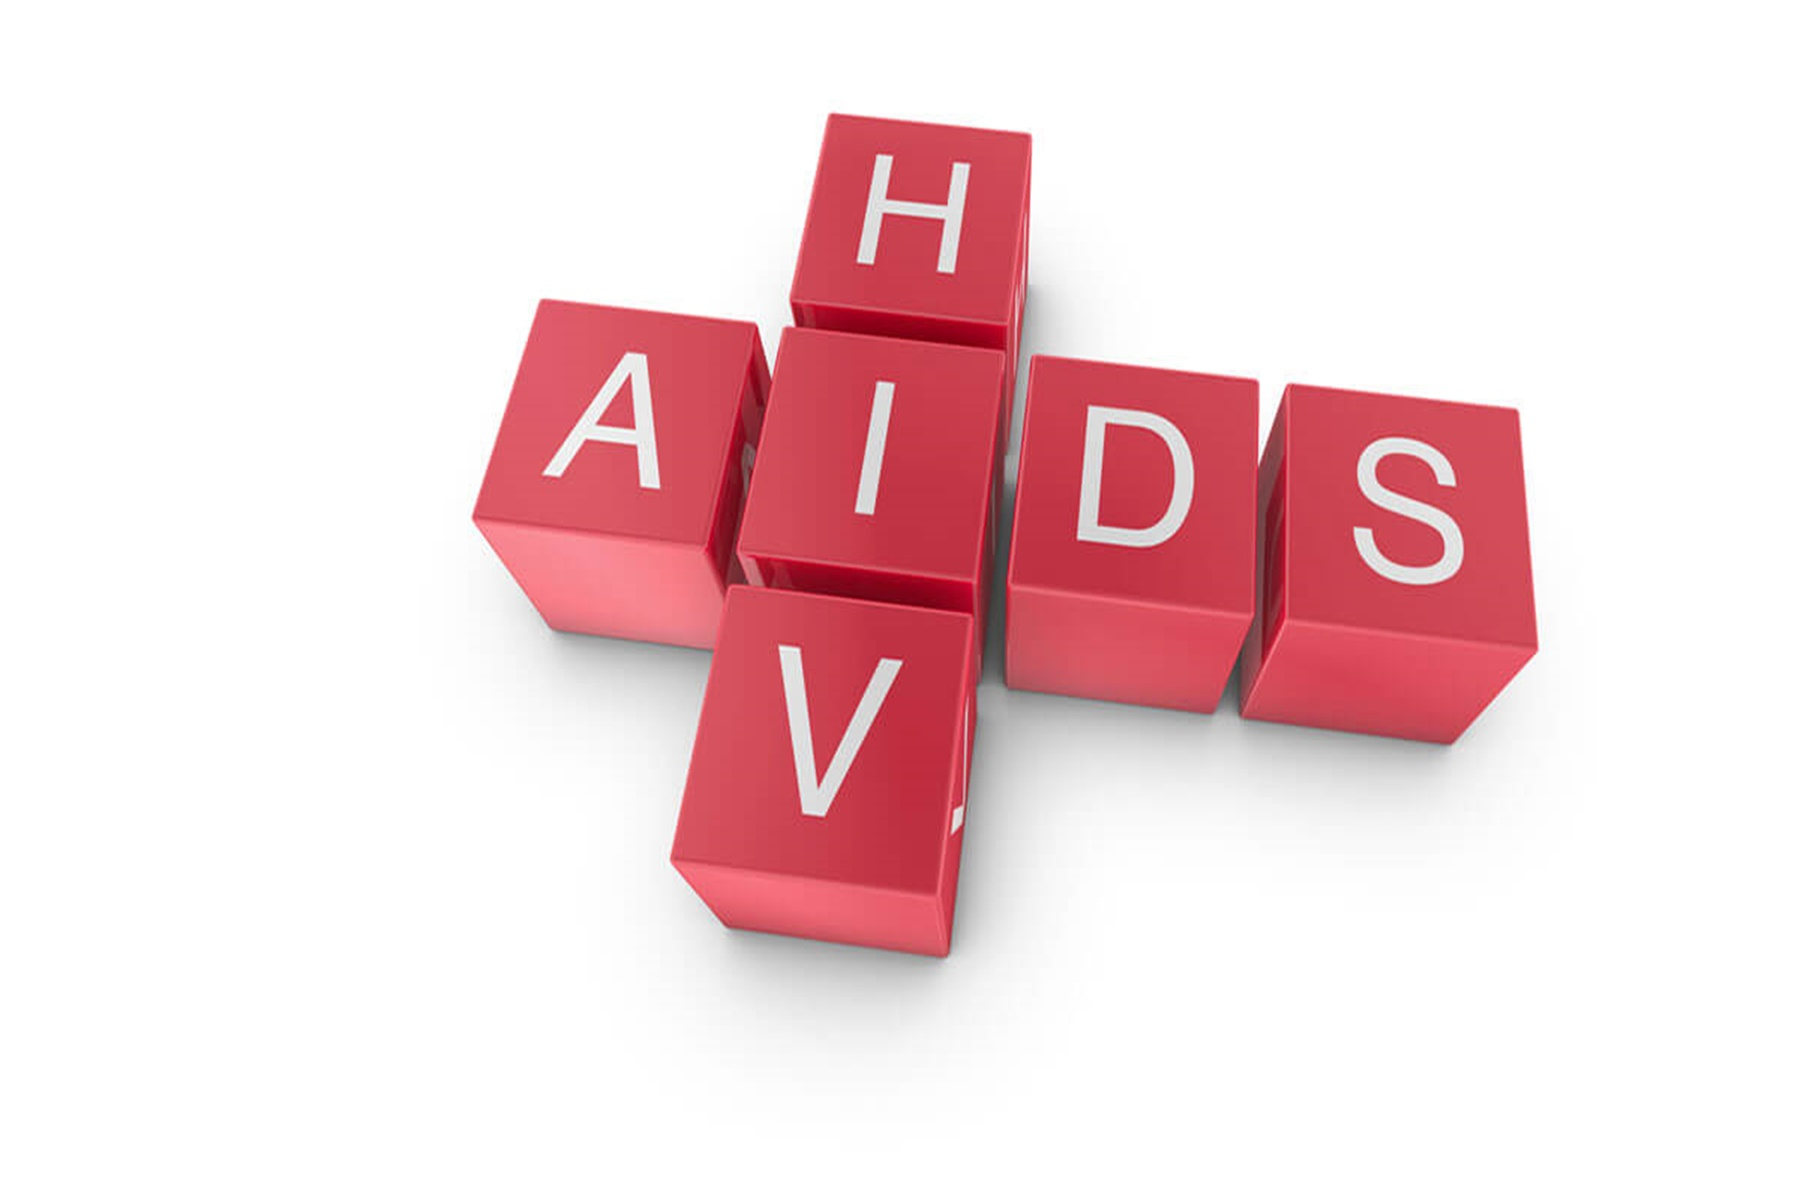 HIV : Αντιρετροϊκή θεραπεία αυξάνει το προσδόκιμο ζωής των ασθενών